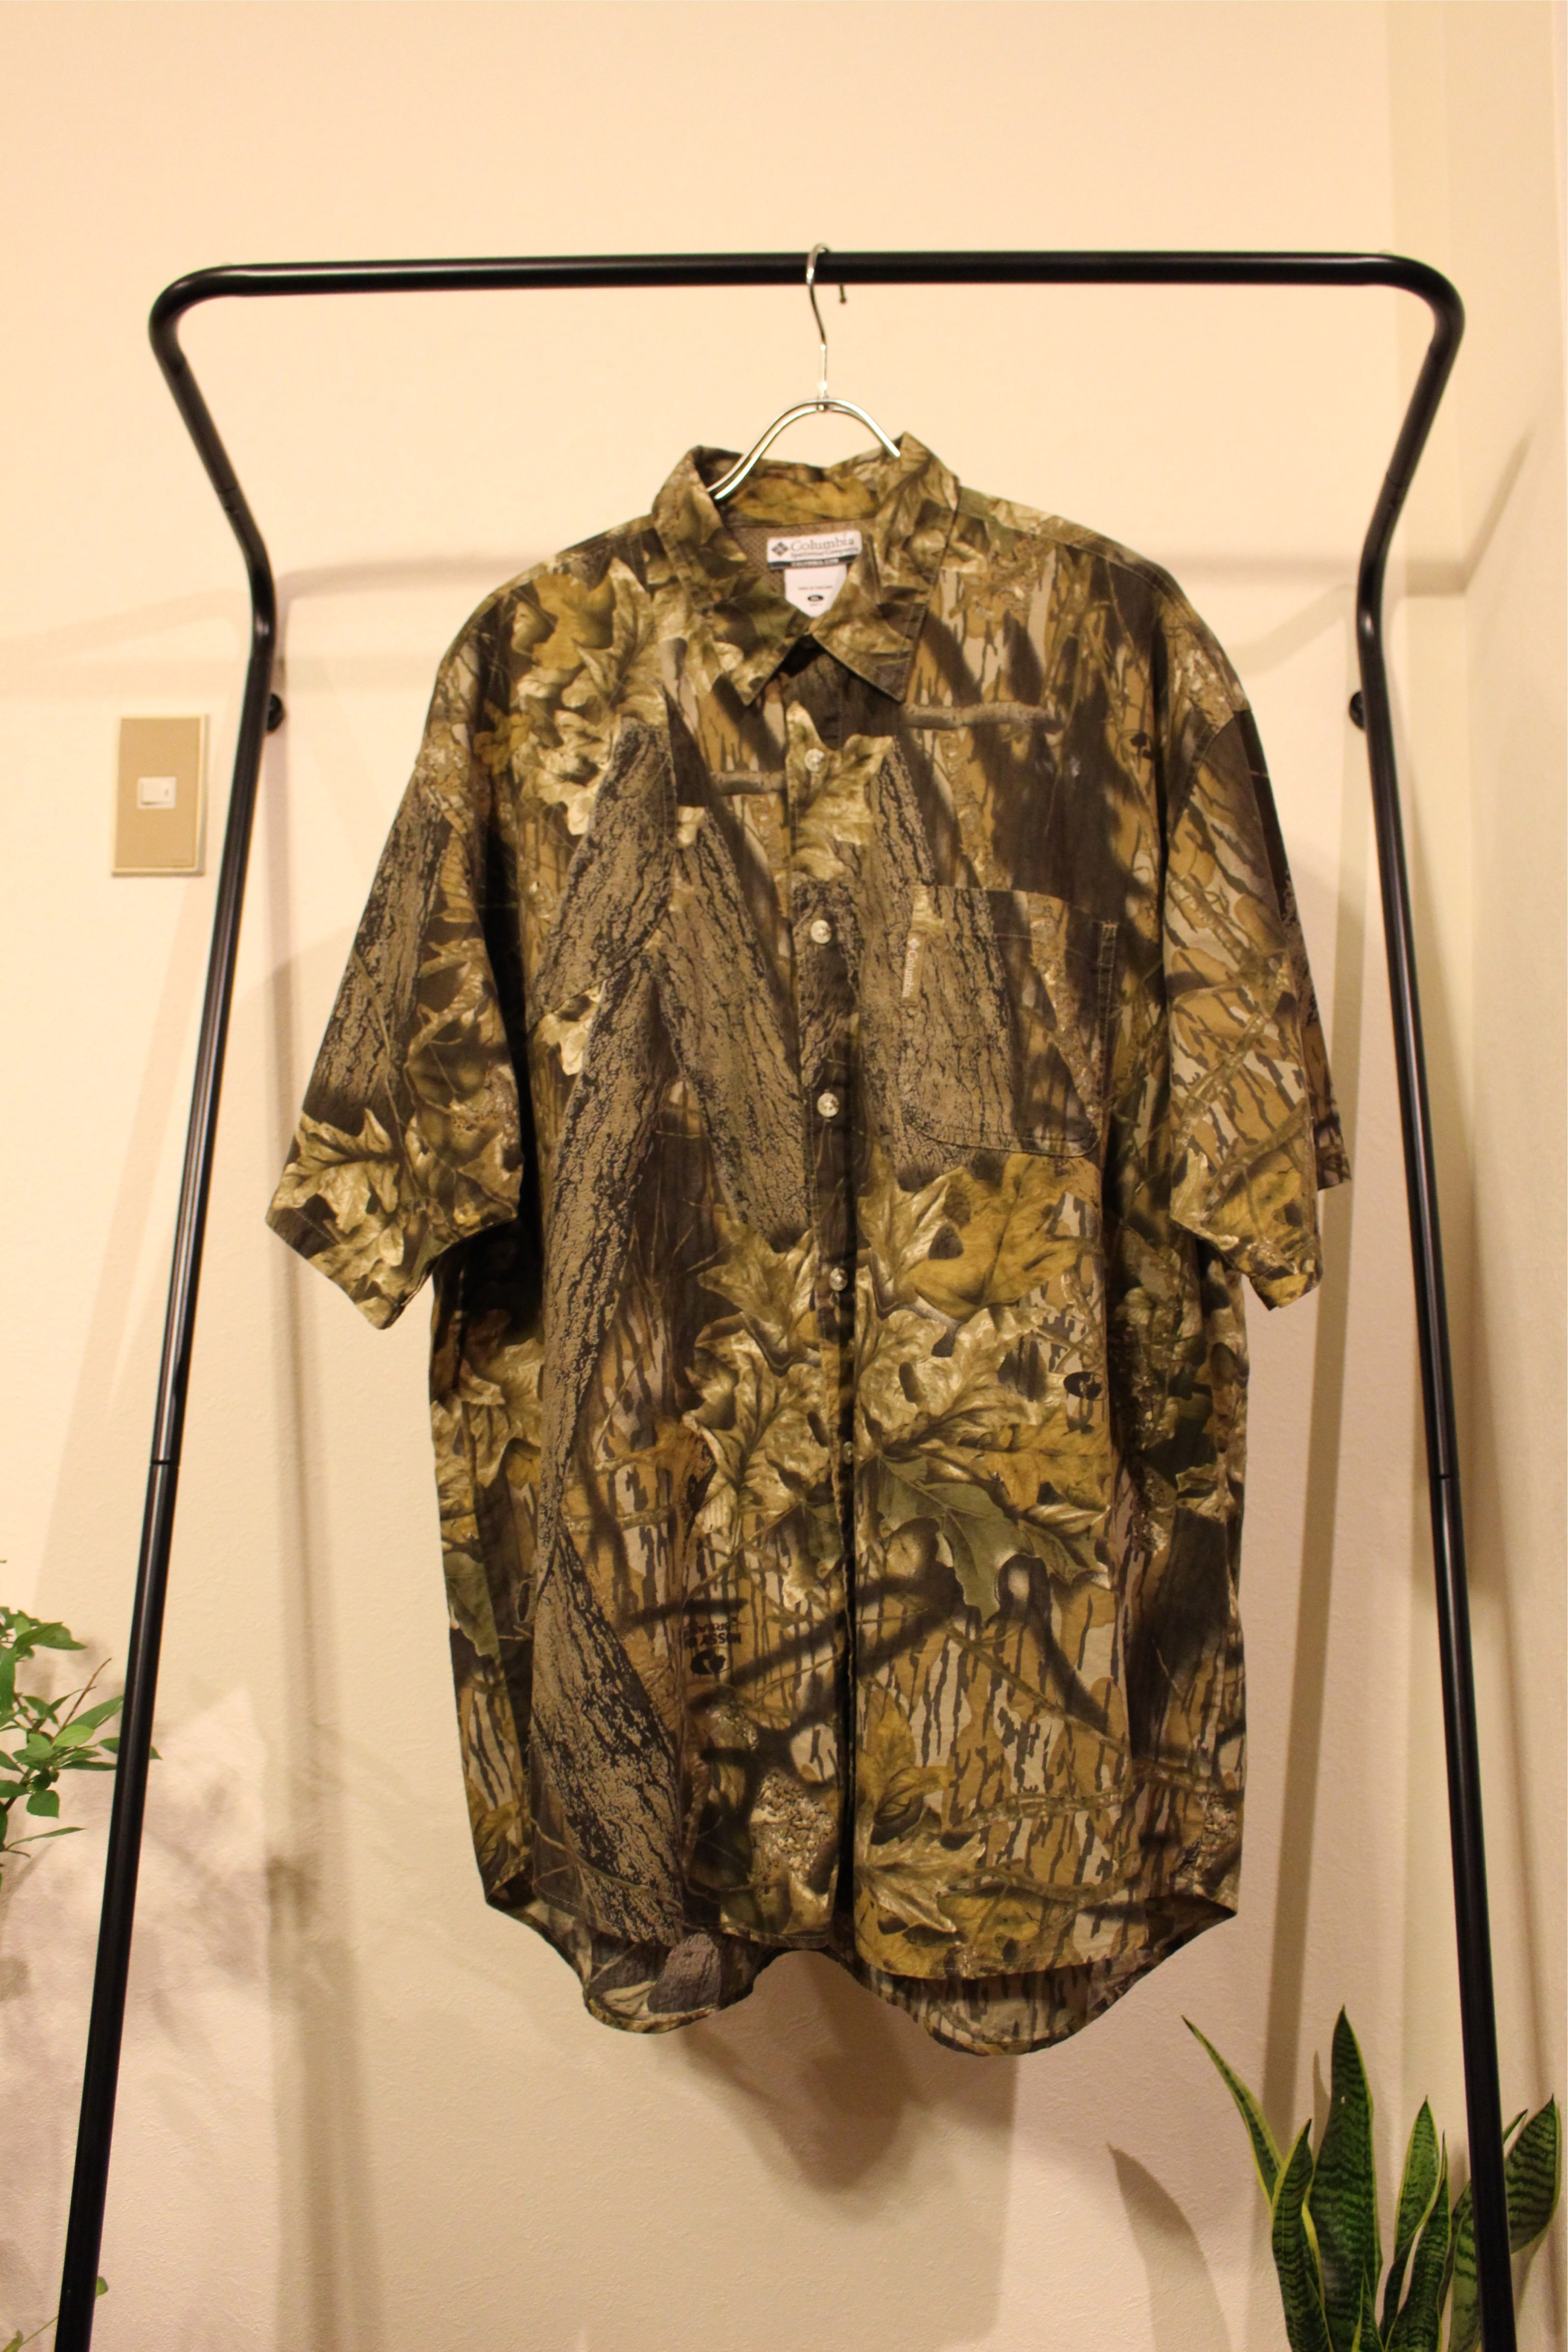 Design camouflage shirt